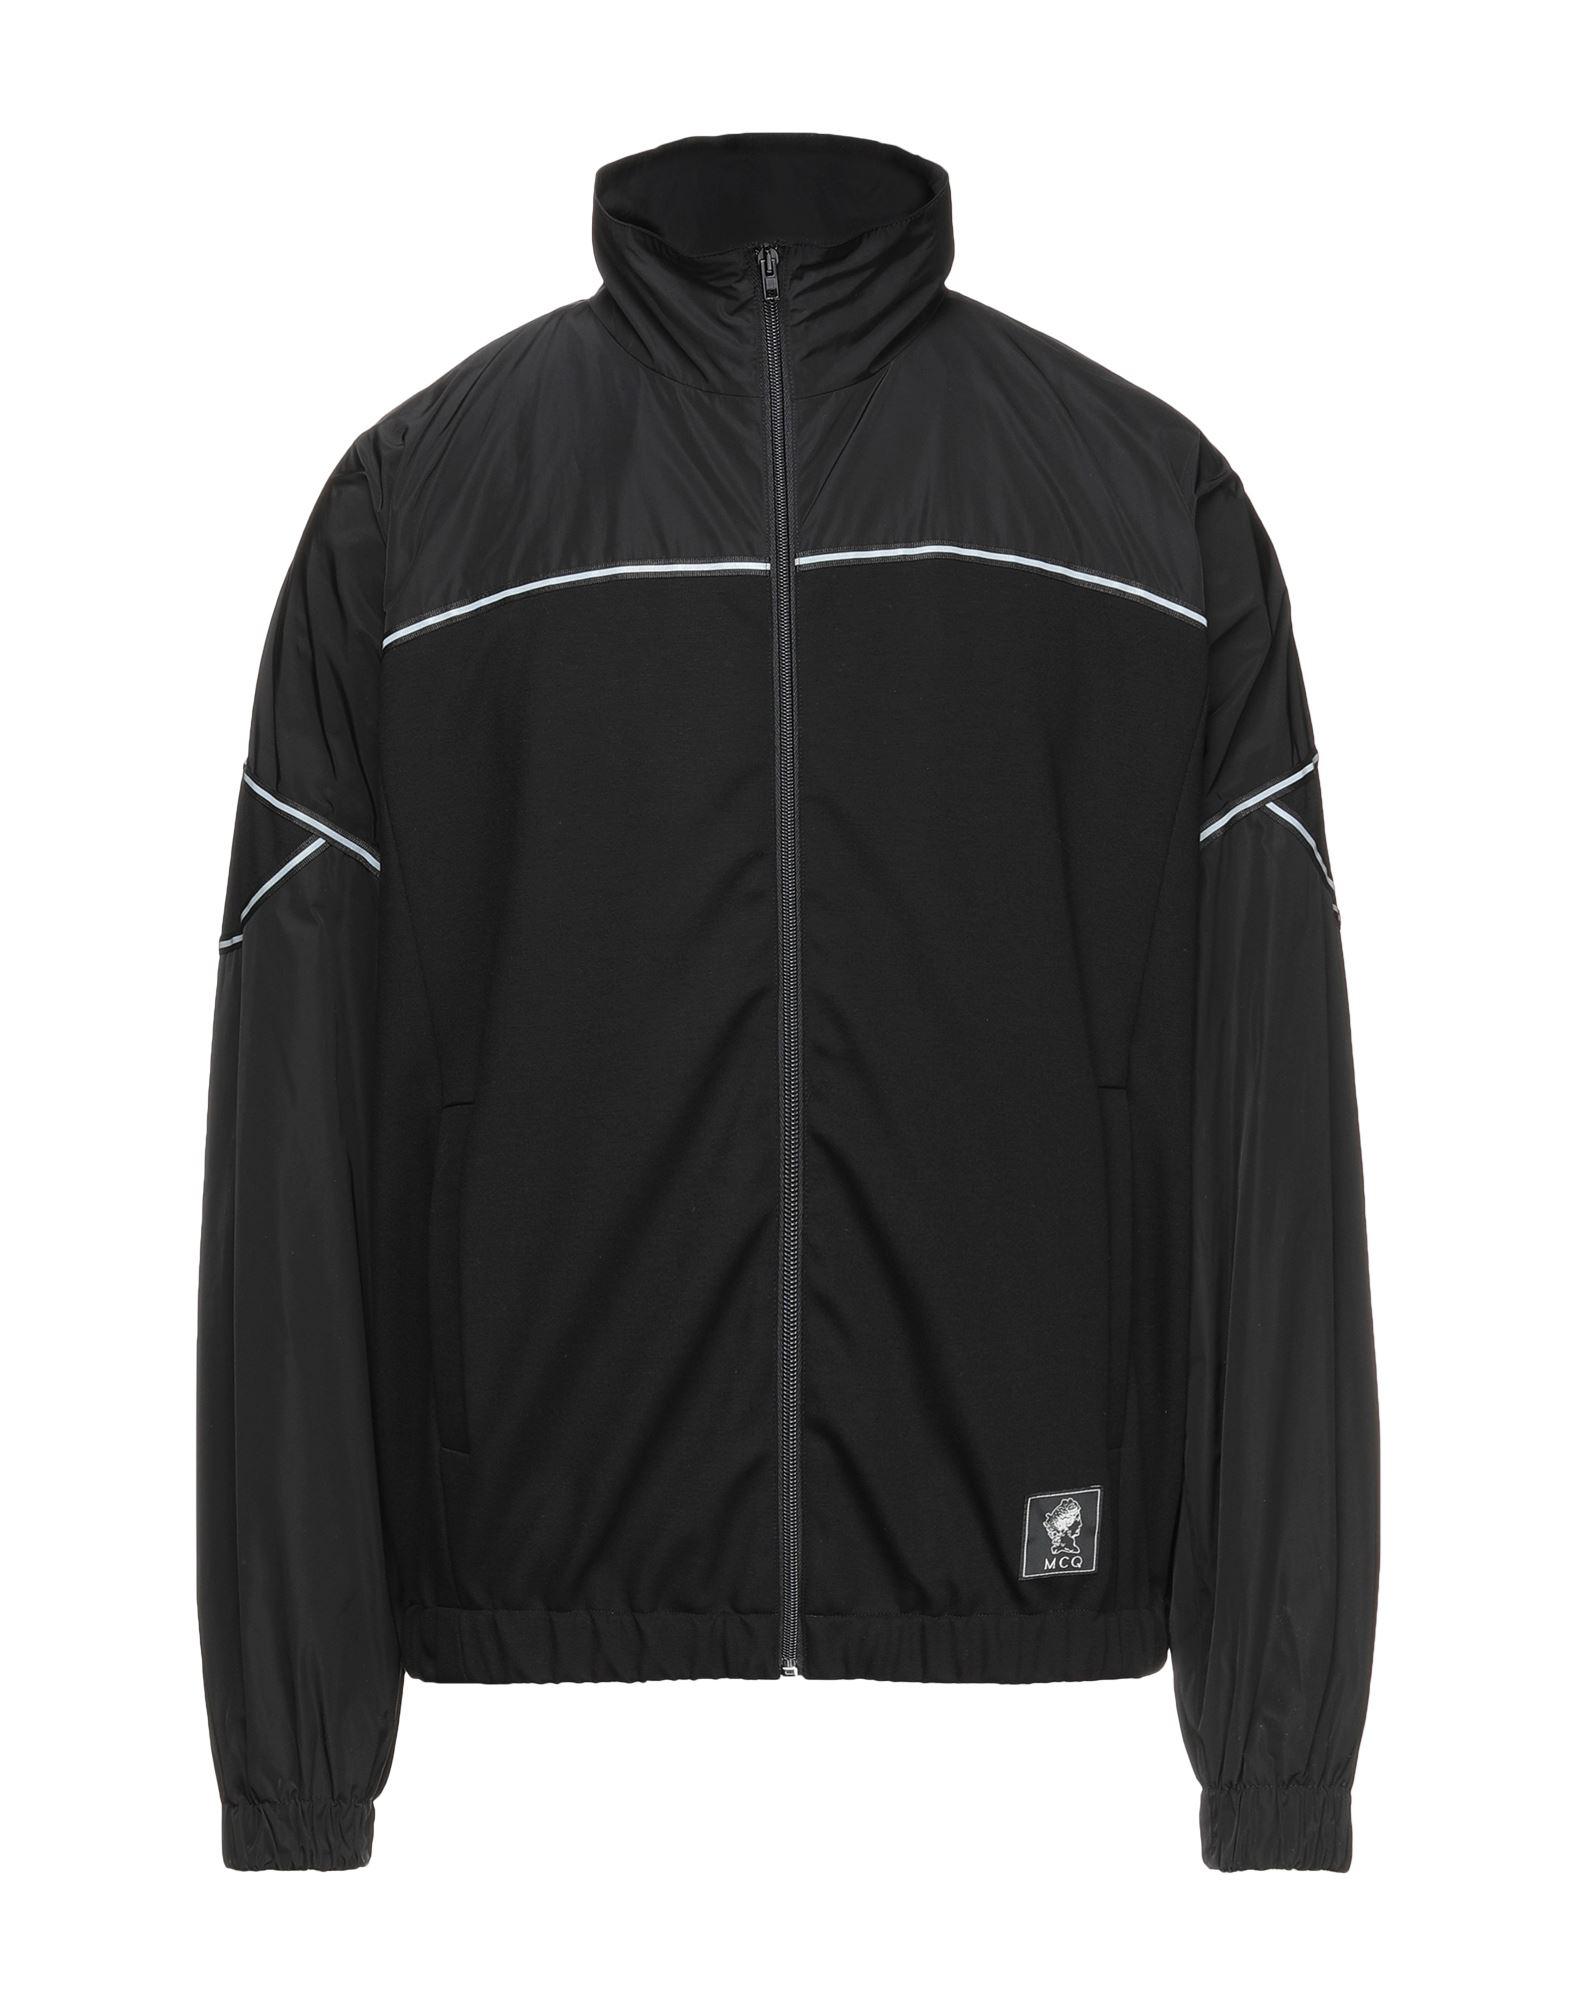 McQ Alexander McQueen Jackets - Item 16006858